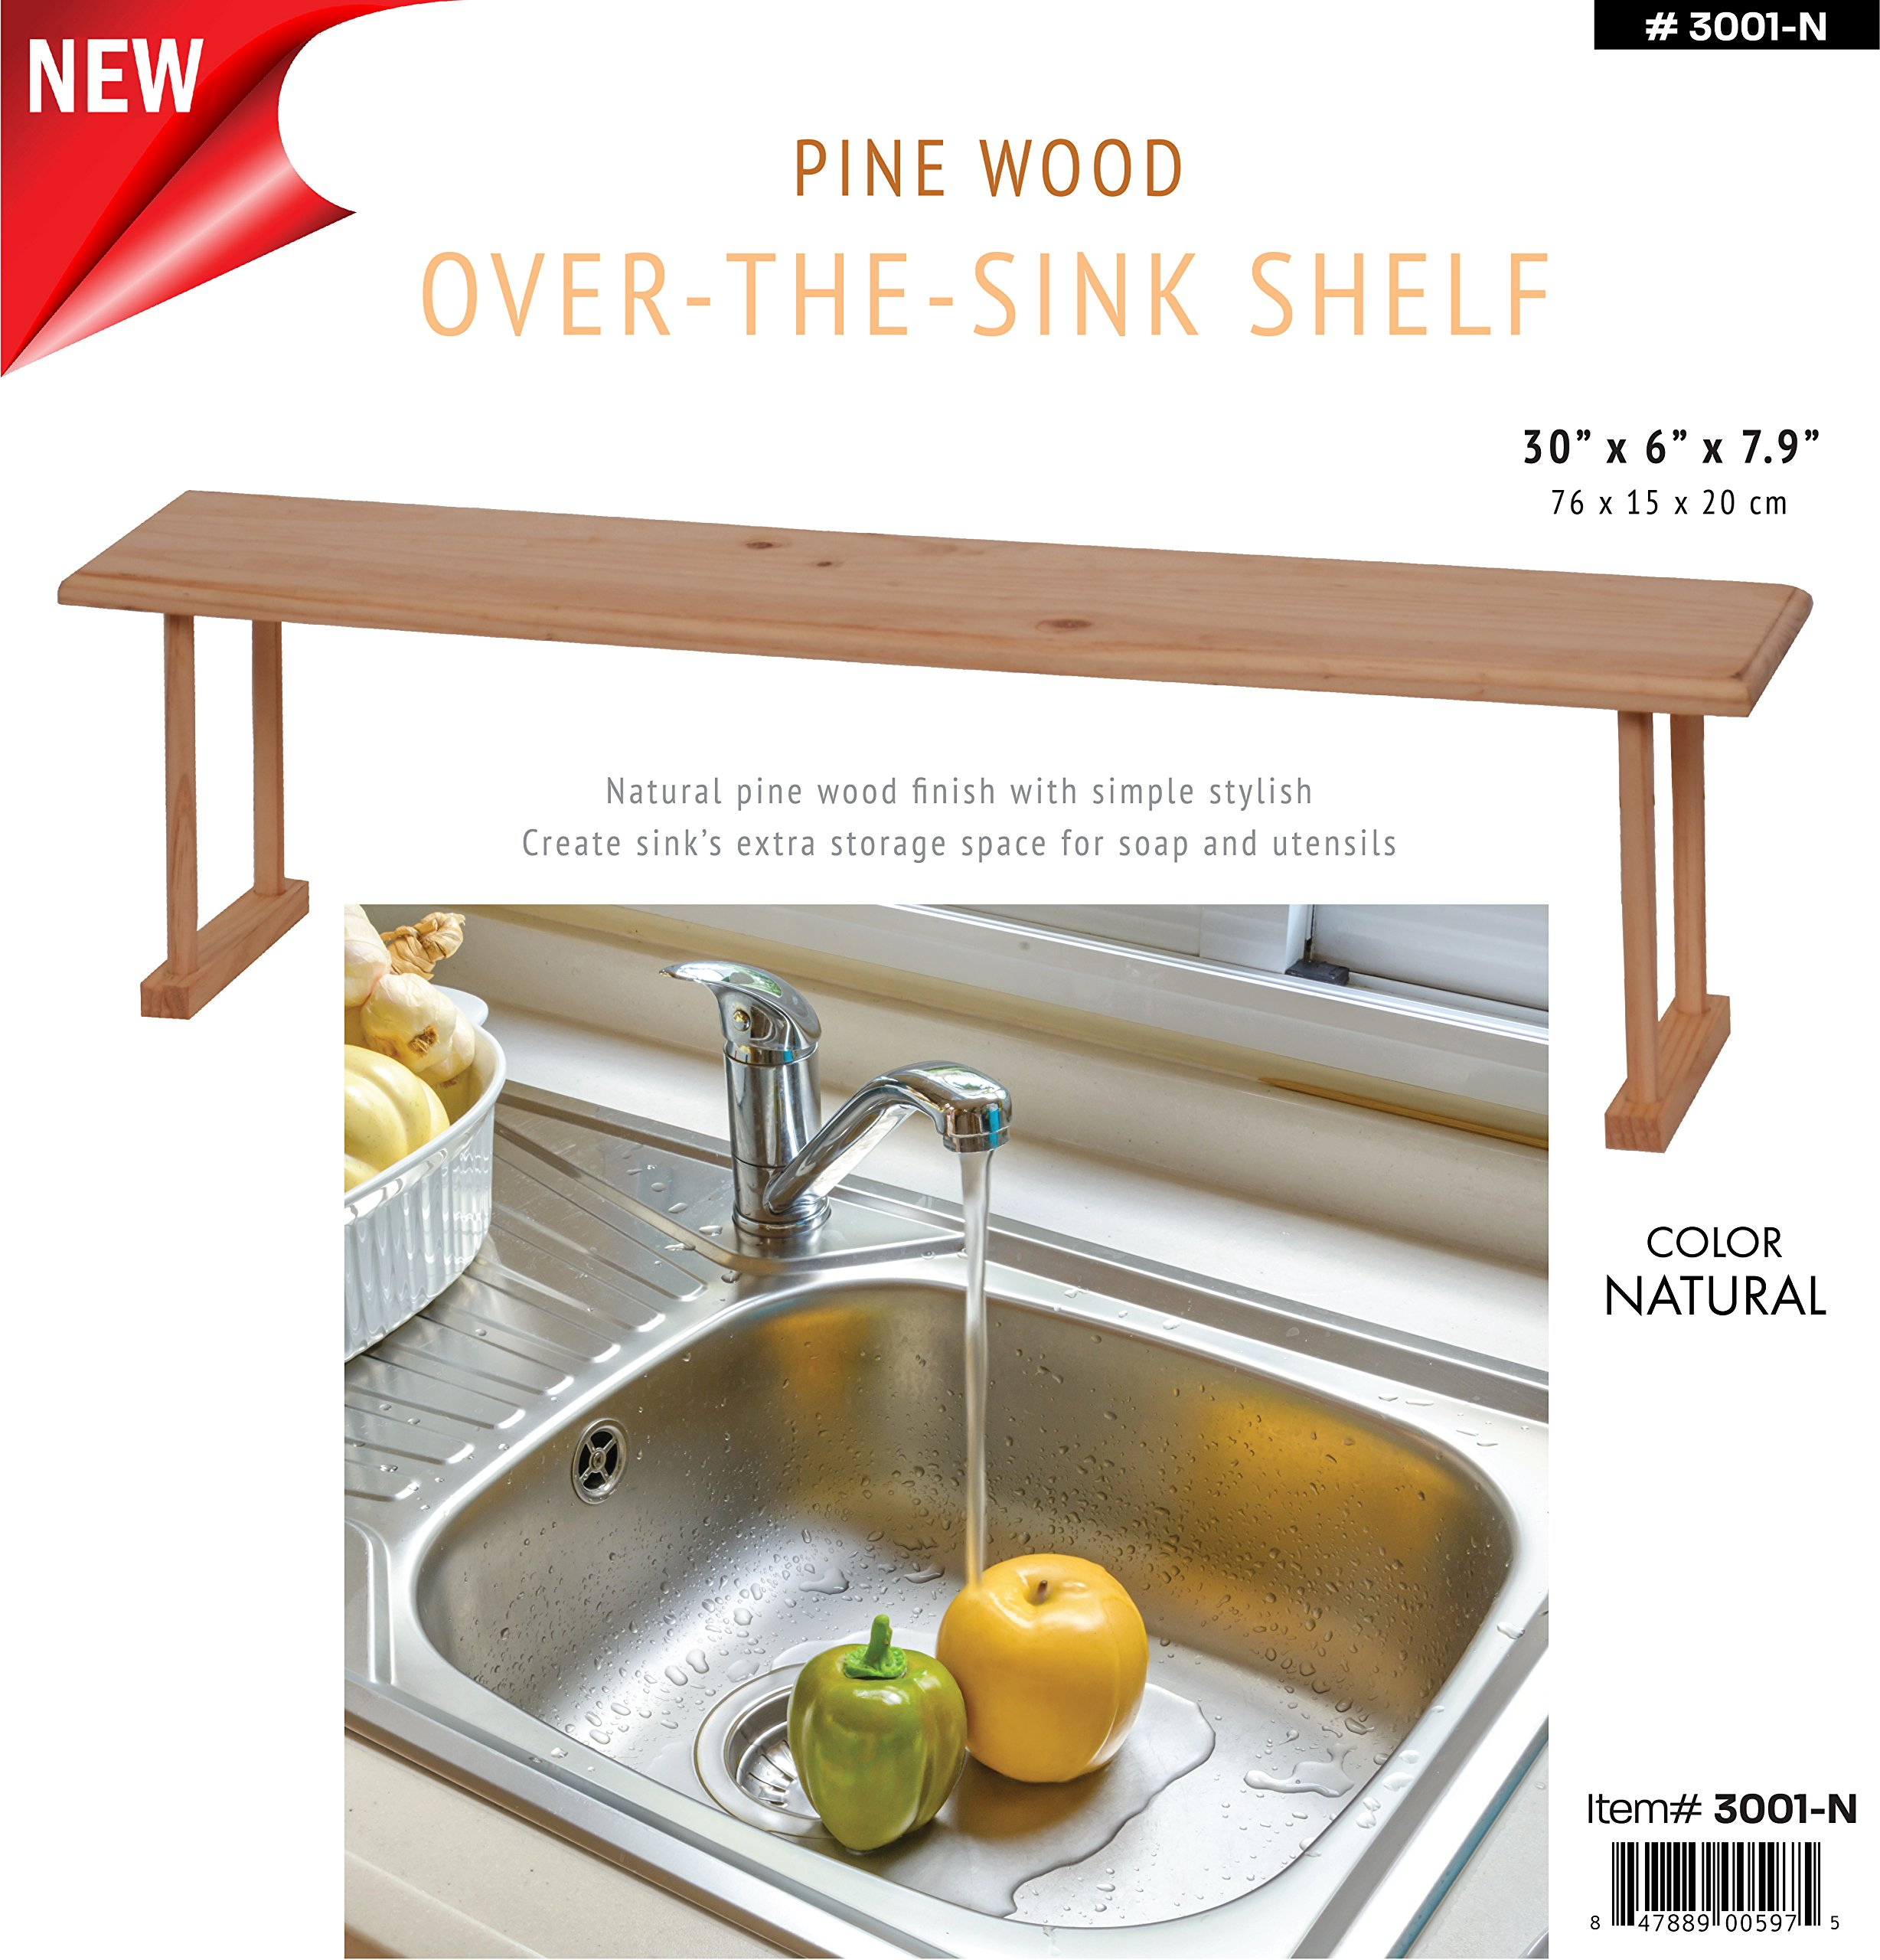 Wee's Beyond 3001-N Wood Over the Sink Storage Shelf, Natural